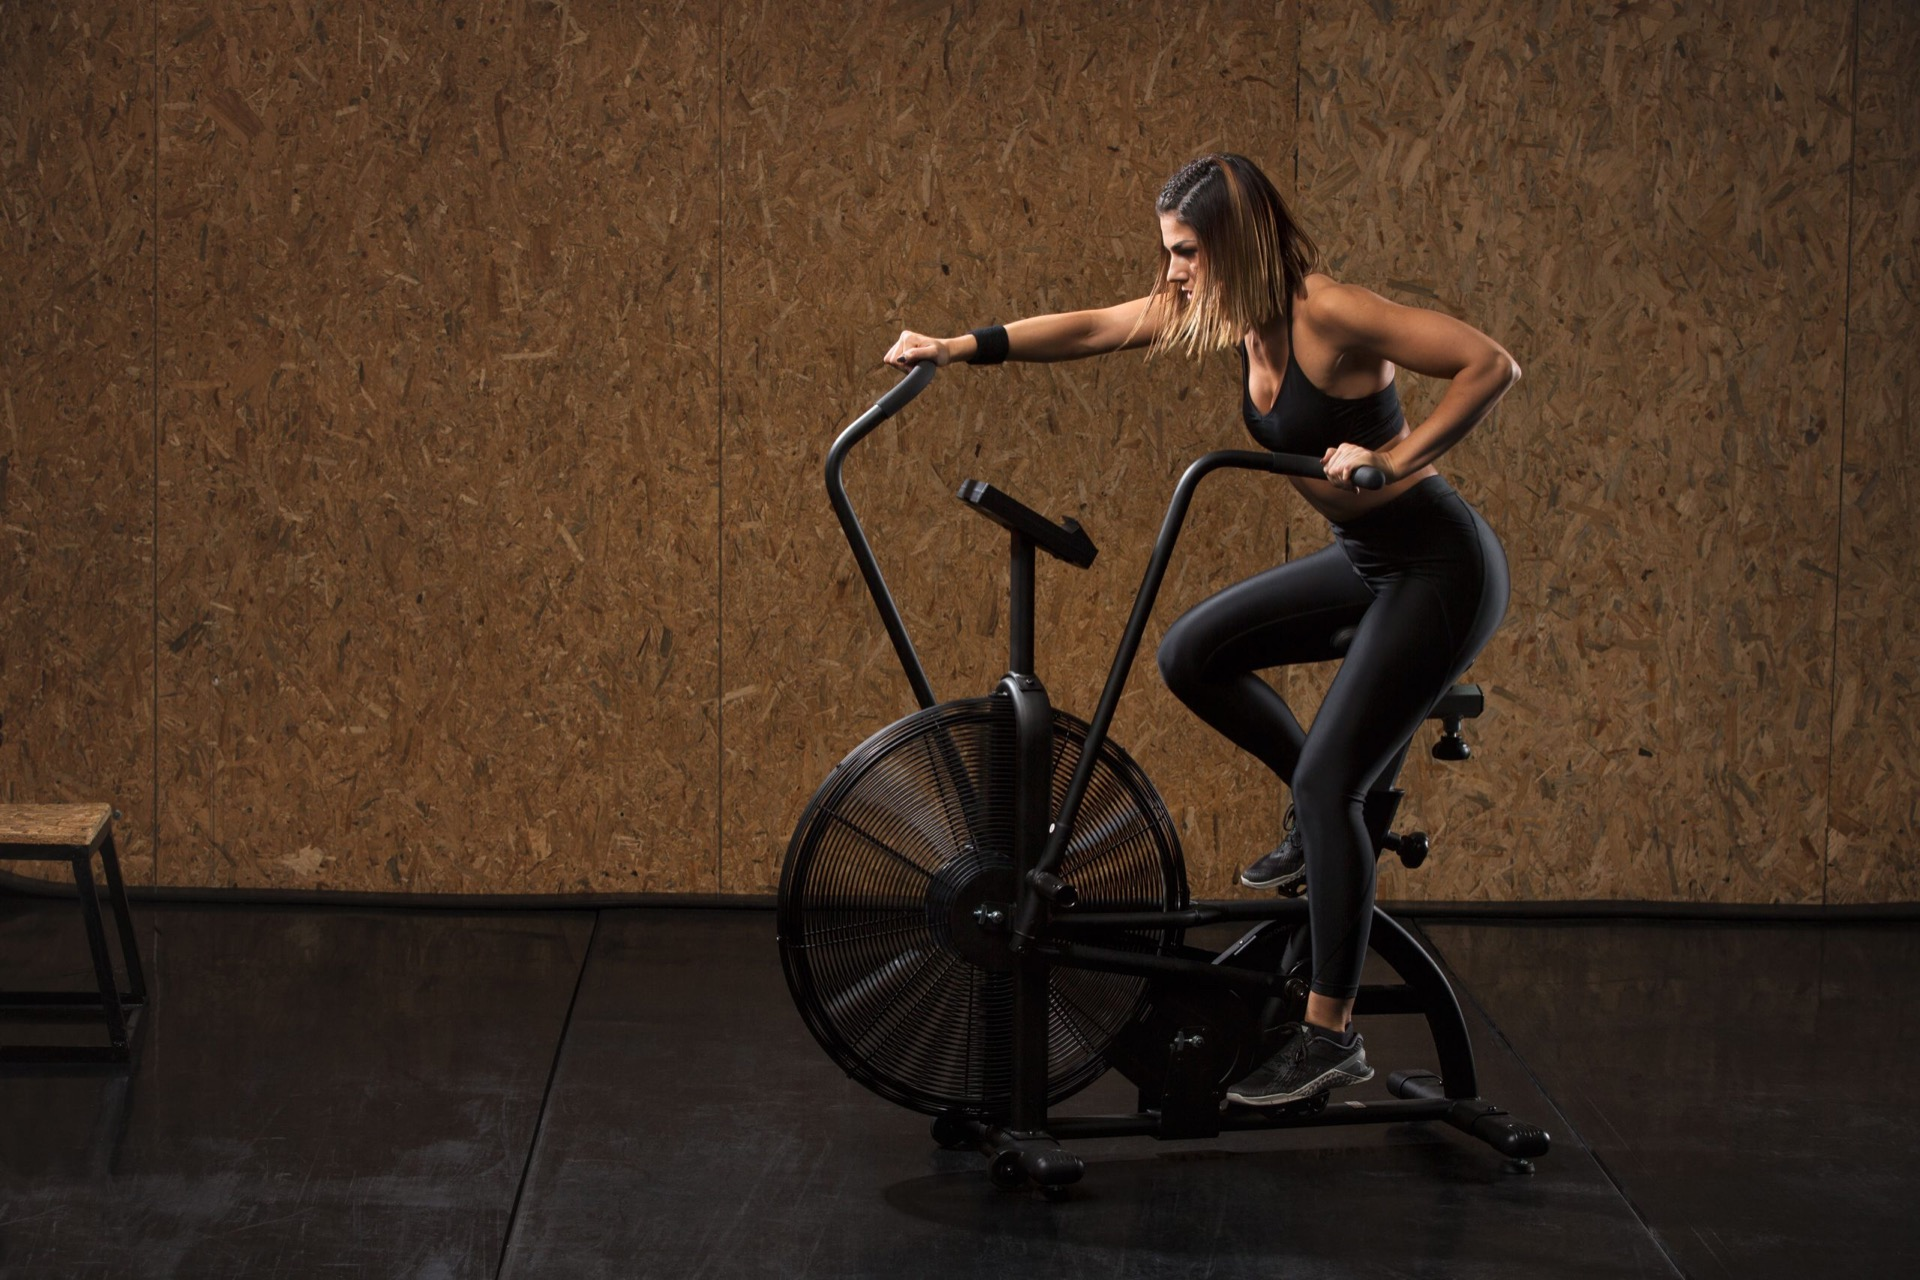 HIIT trening assault bike